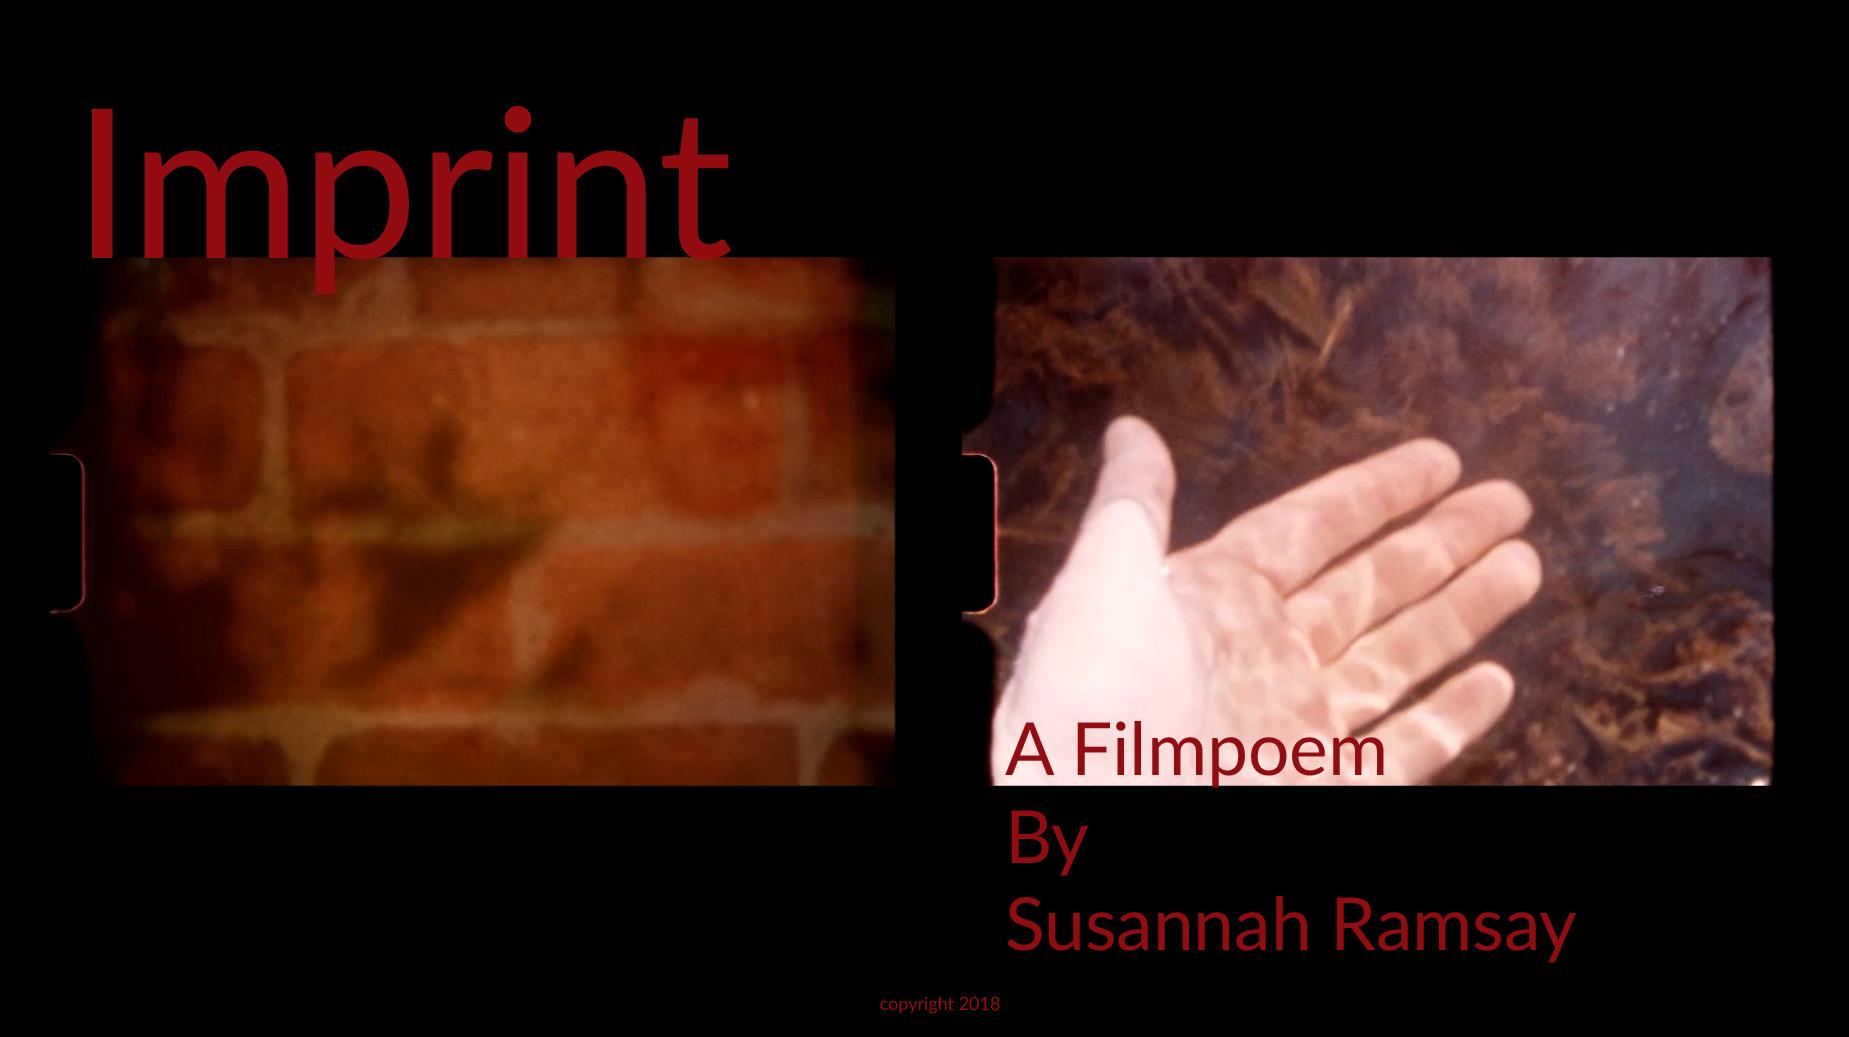 Imprint film poster